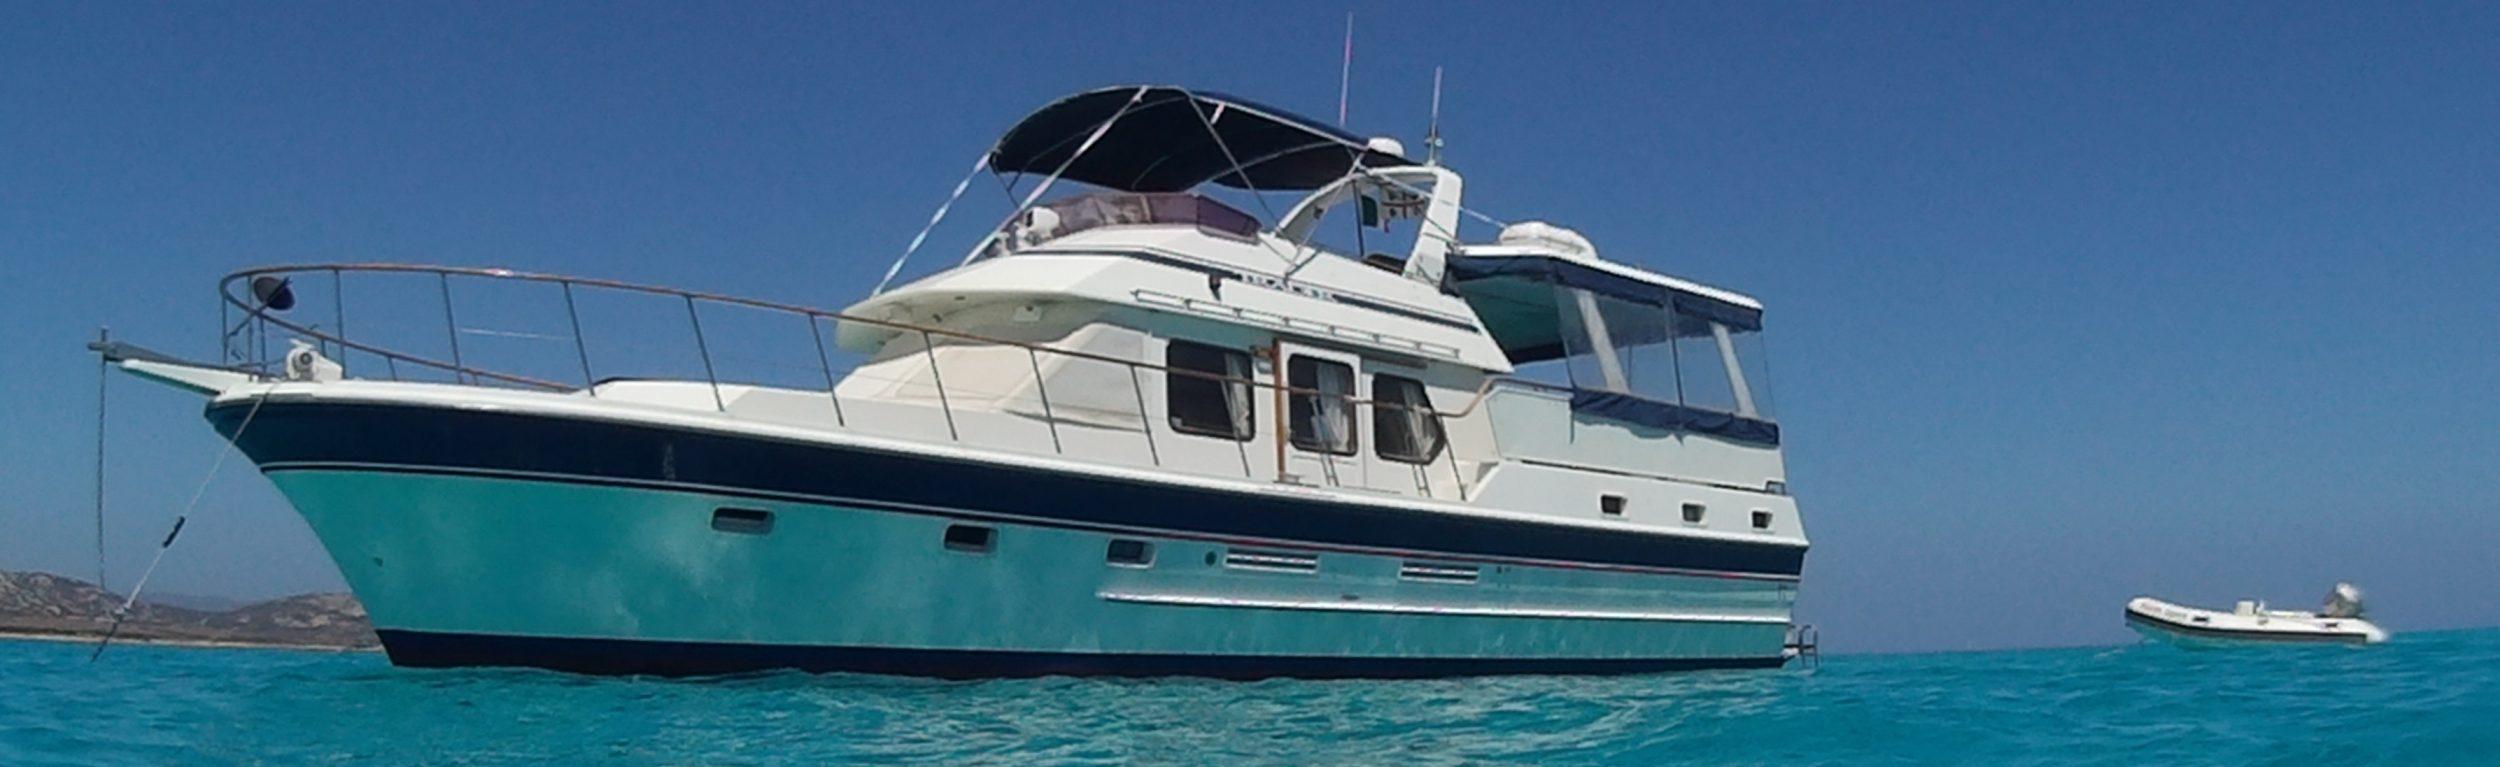 Trader 50 motoryacht for sale: 140.000,- €